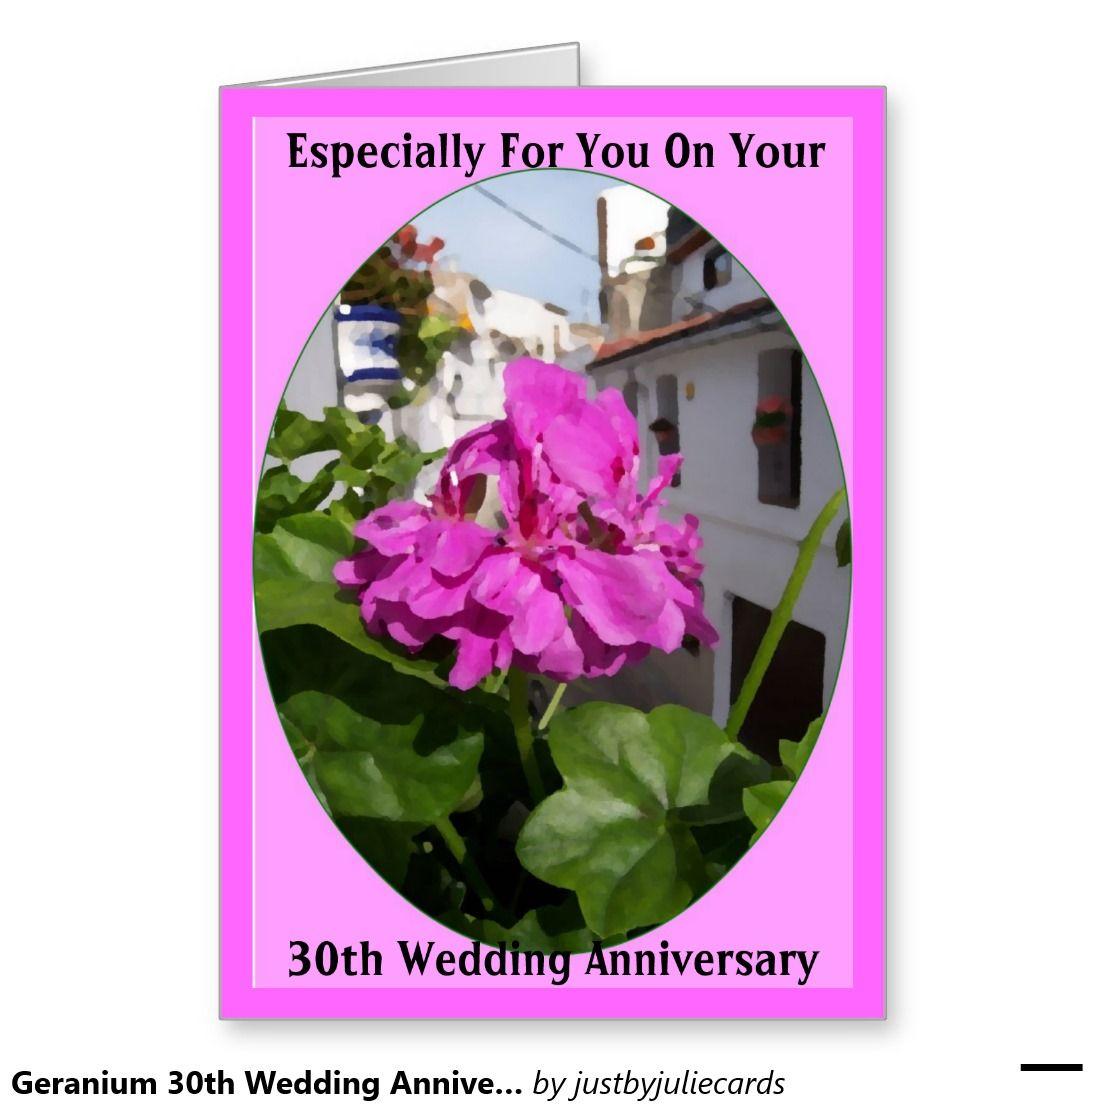 Geranium 30th Wedding Anniversary Card 30 Wedding Anniversary